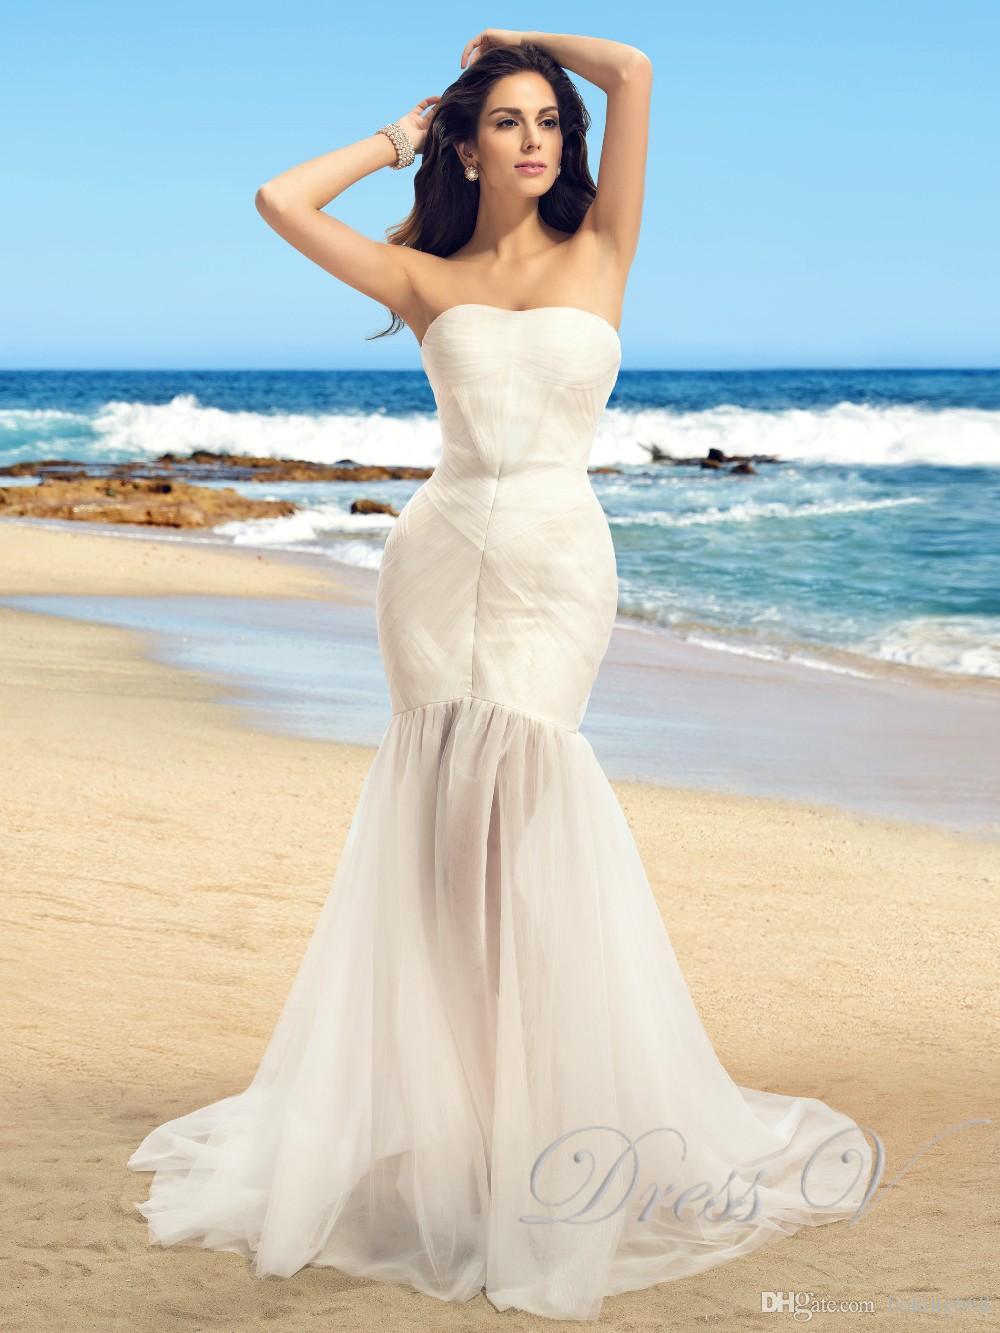 Discount Romantic Summer Beach Wedding Dresses 2017